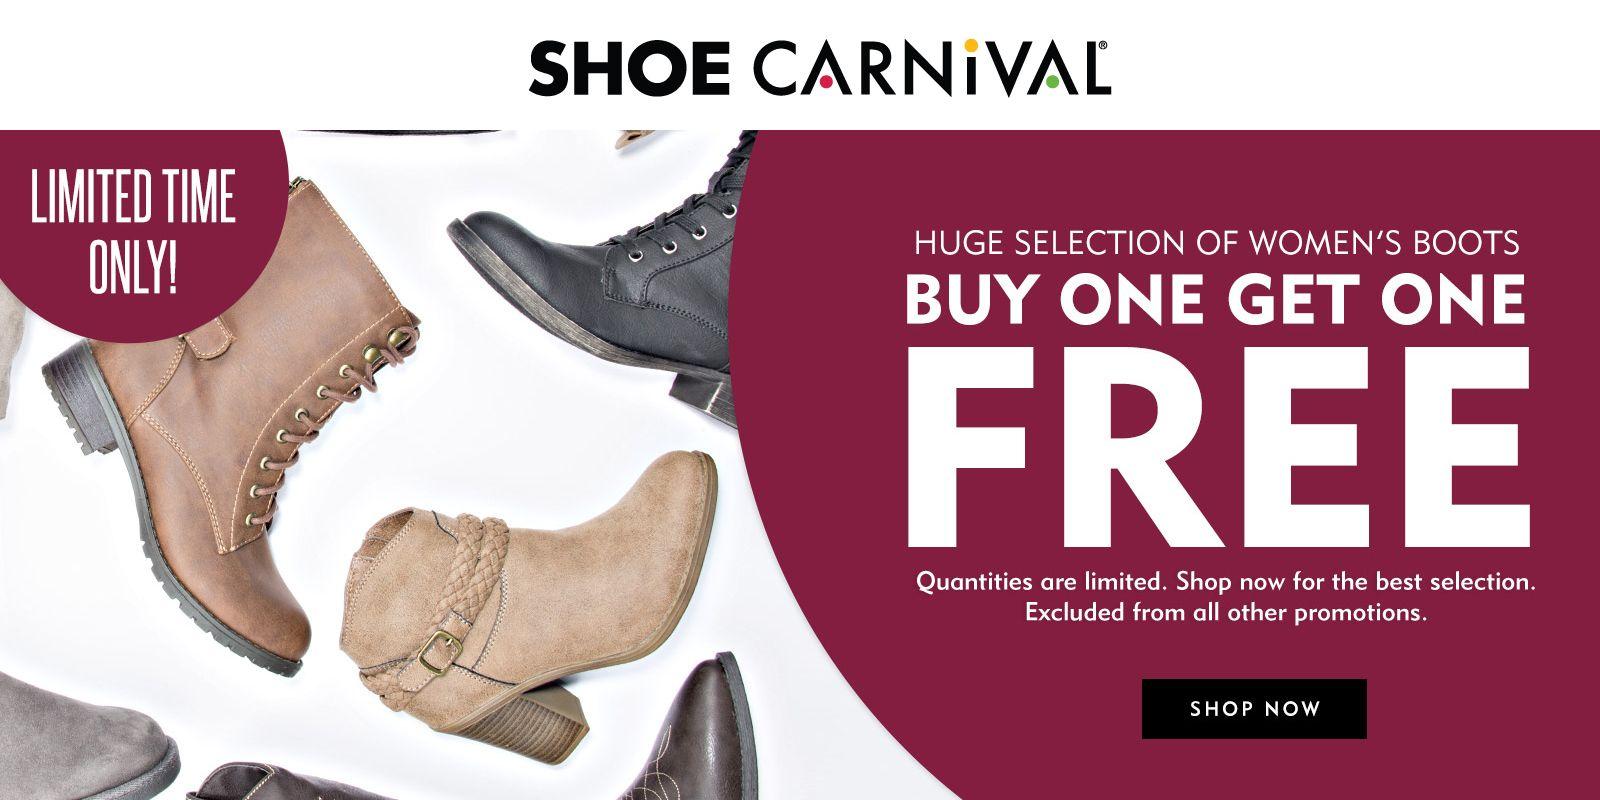 Shoe carnival, Shoes, Stuff to buy